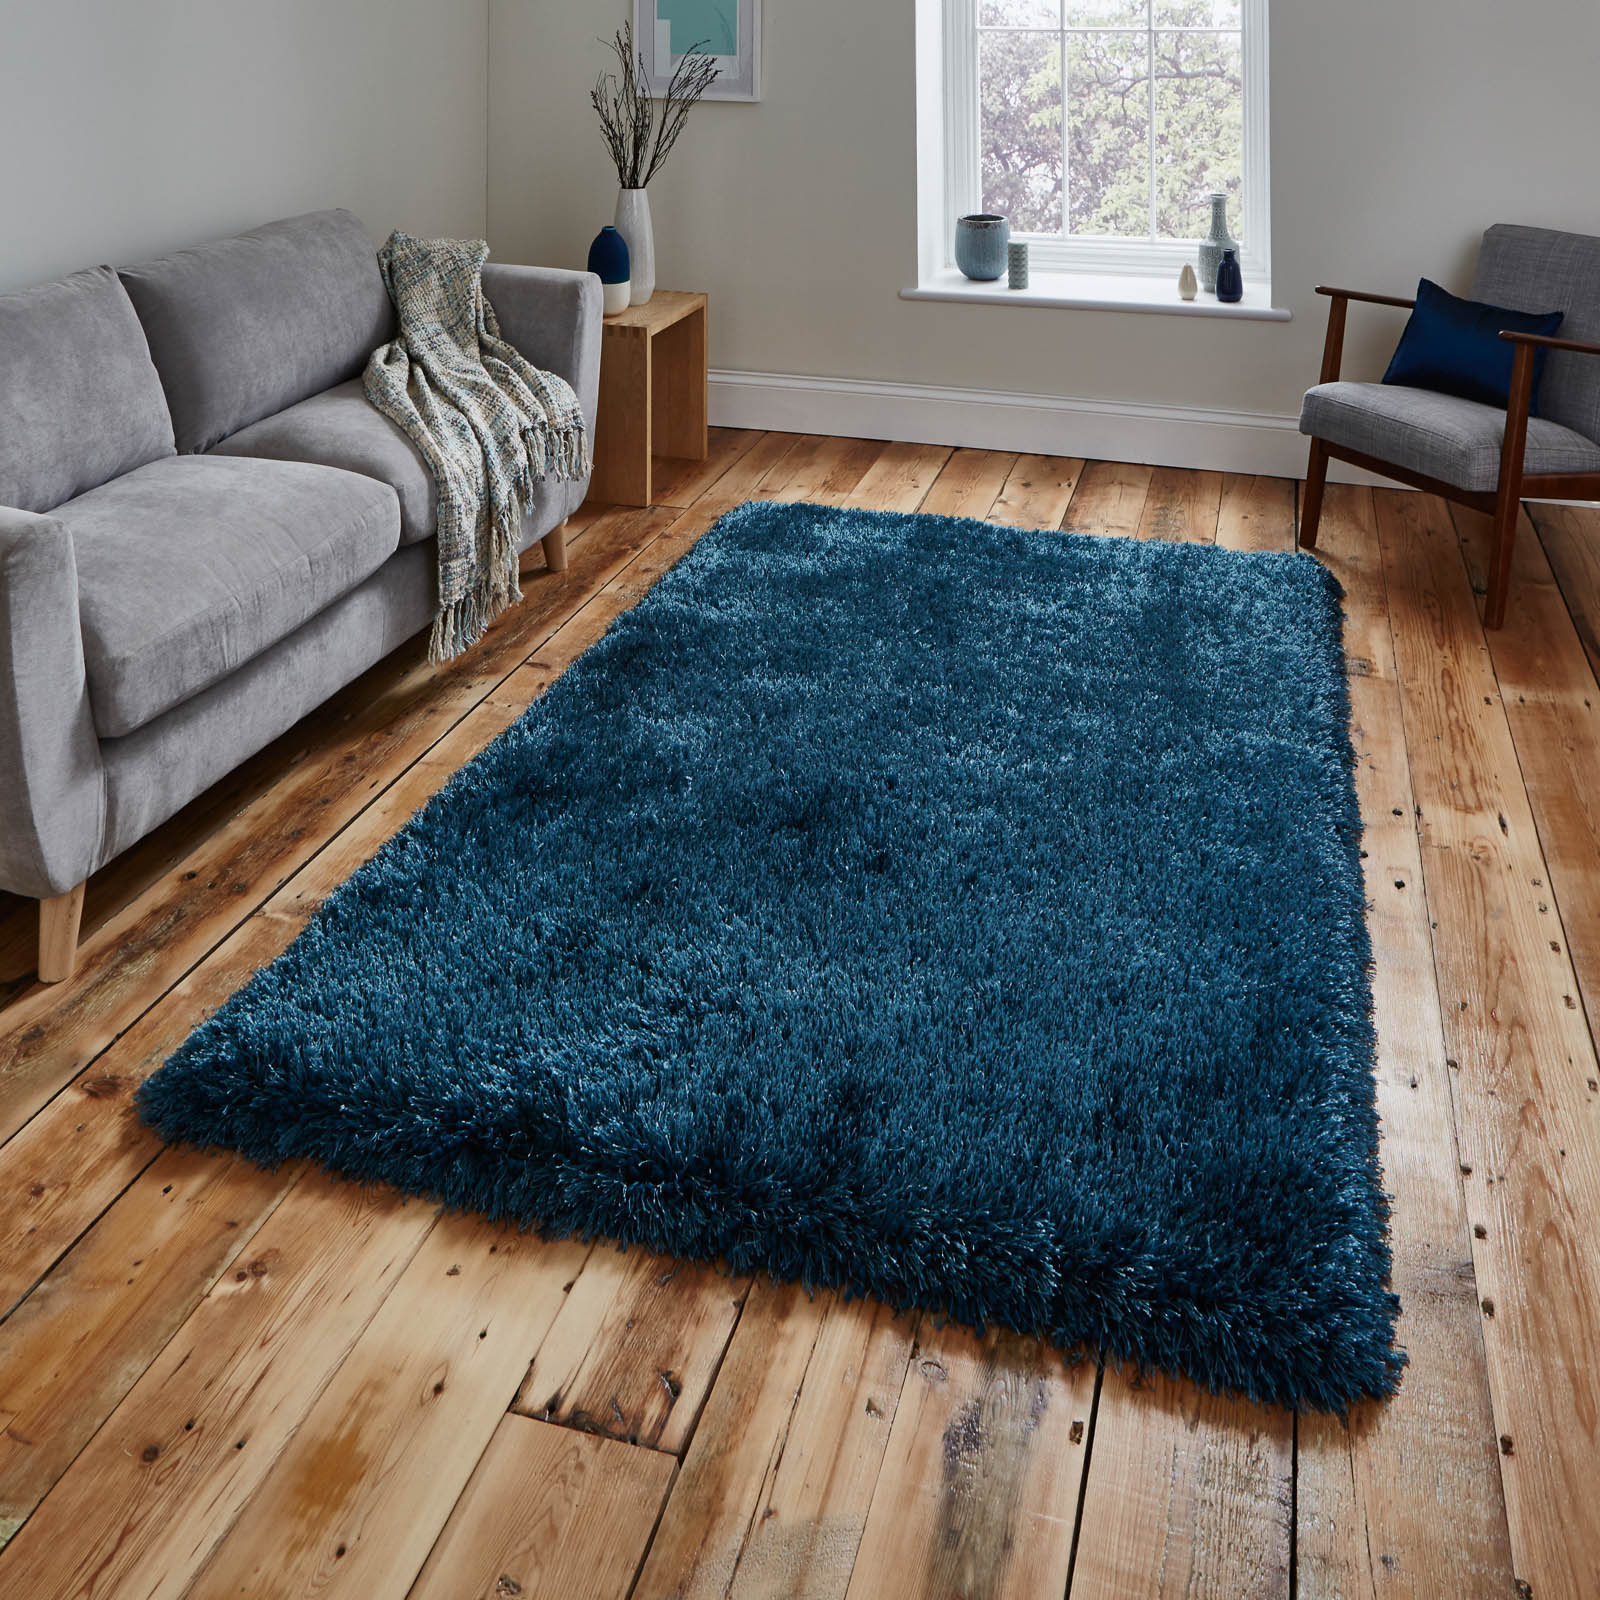 shaggy rugs montana PLCOKPR